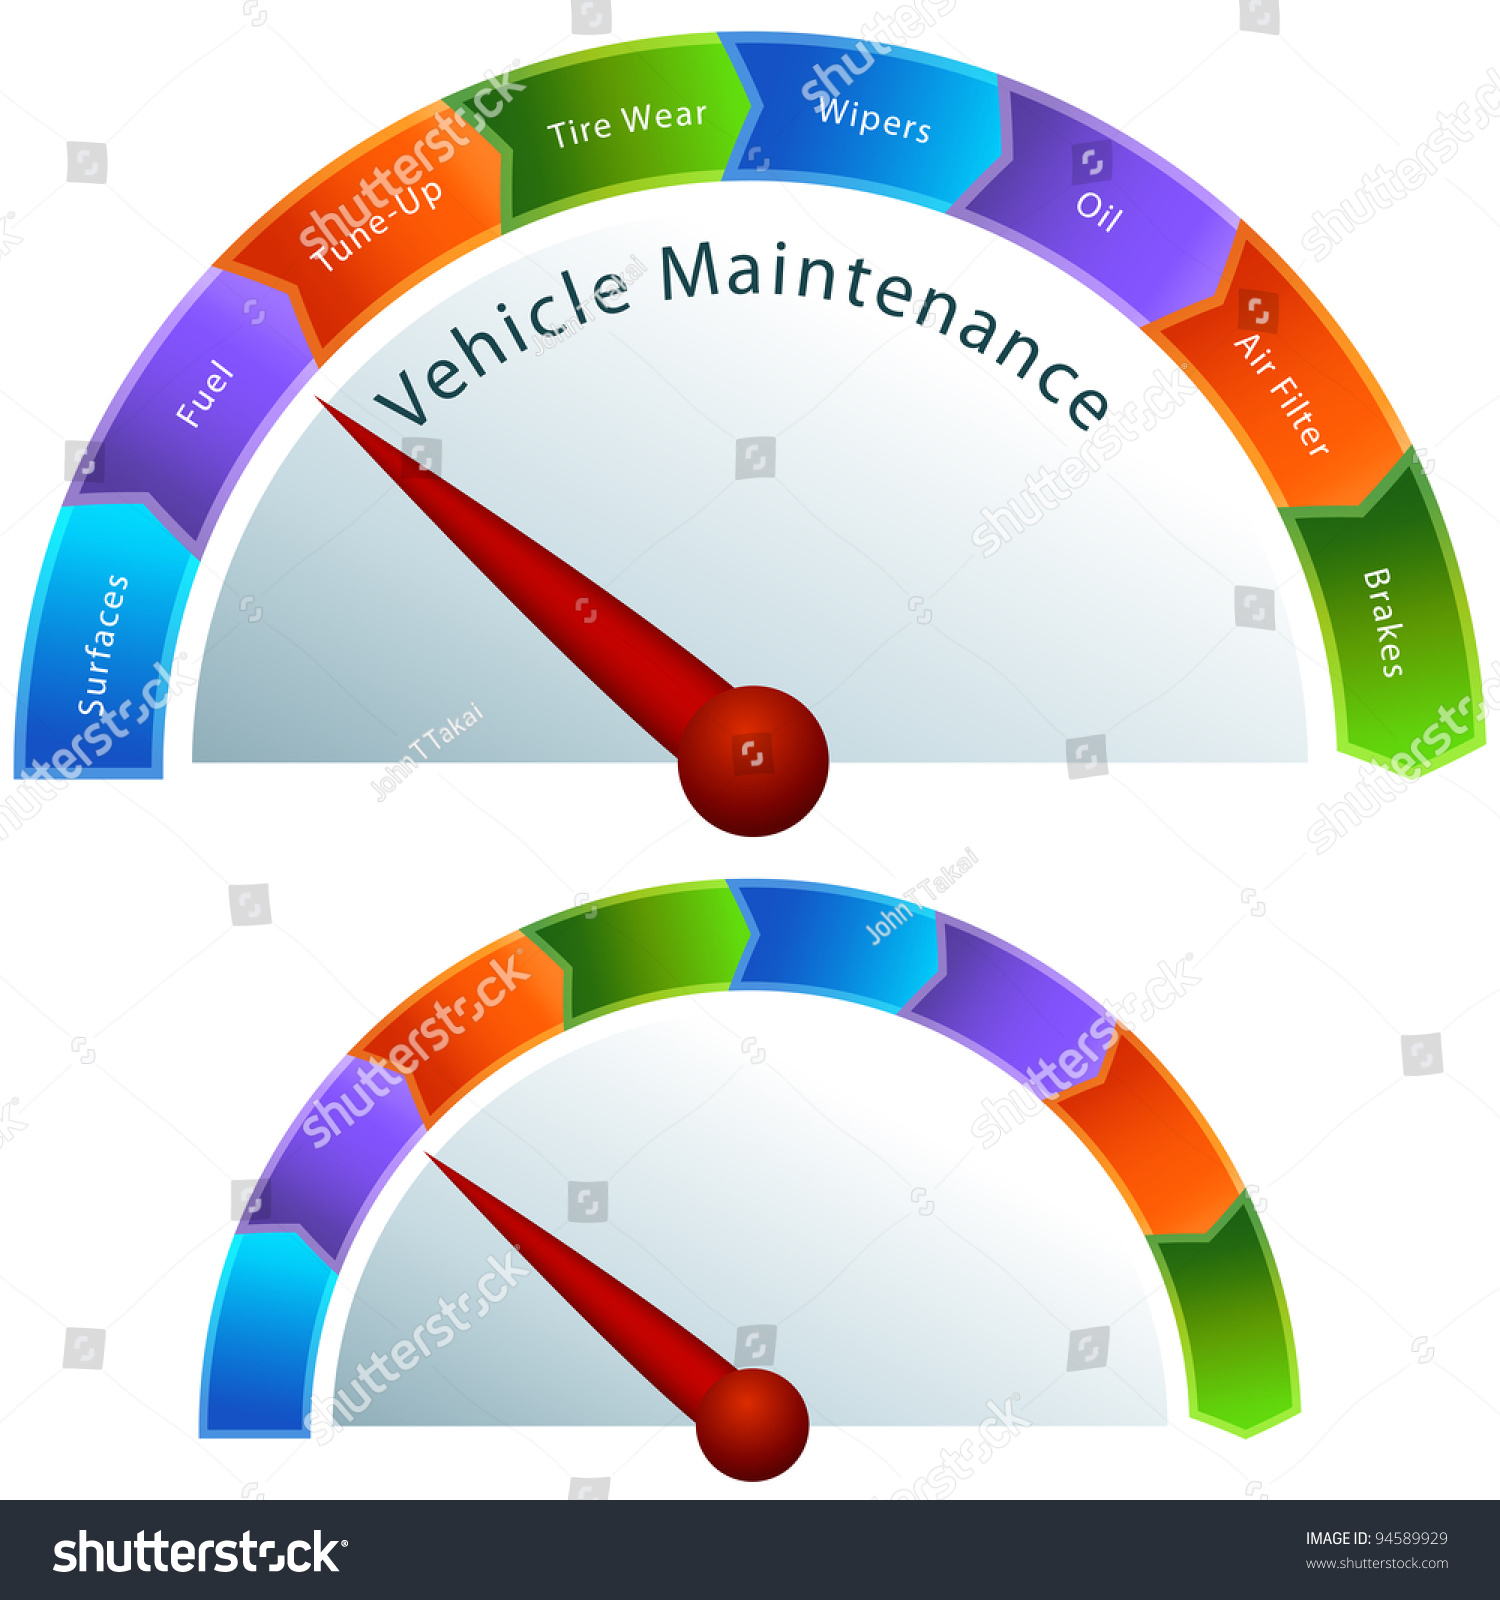 Image Vehicle Maintenance Chart Stock Vector 94589929 ...